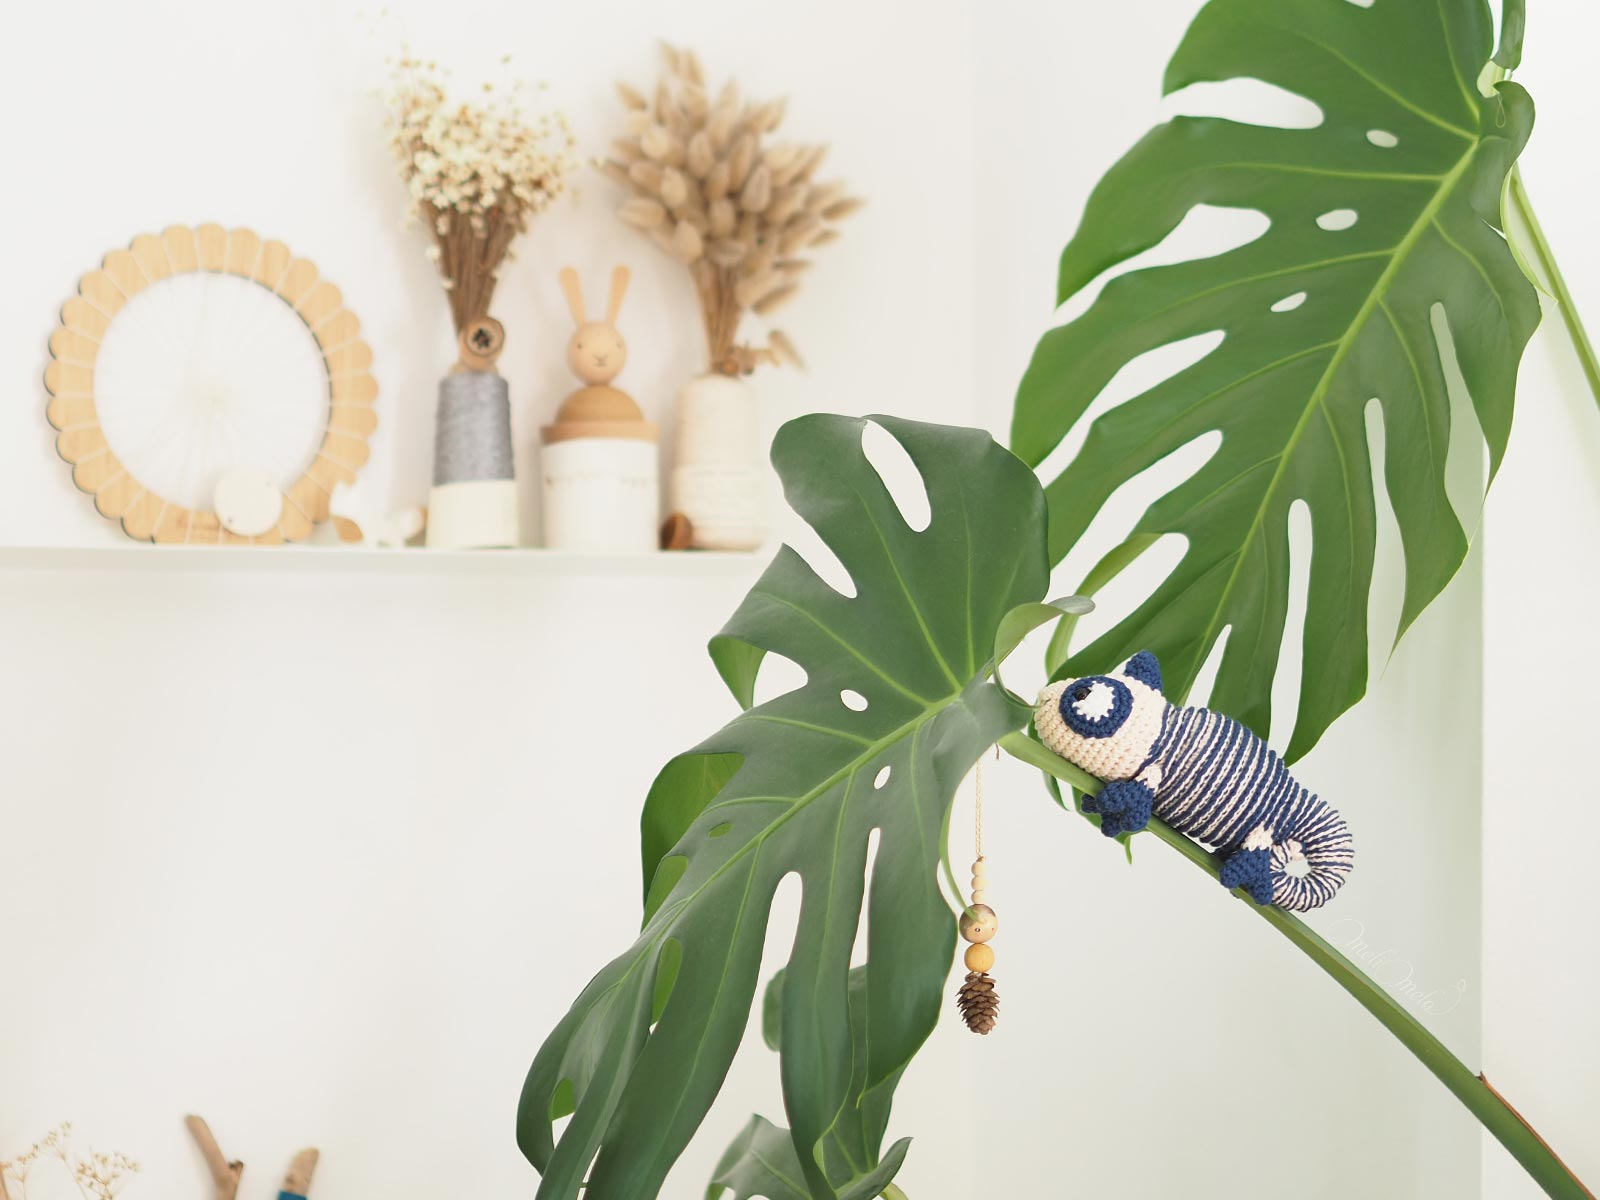 amigurumi-chameleon-mariniere-crochet-atelier-monstera-deliciosa-laboutiquedemelimelo